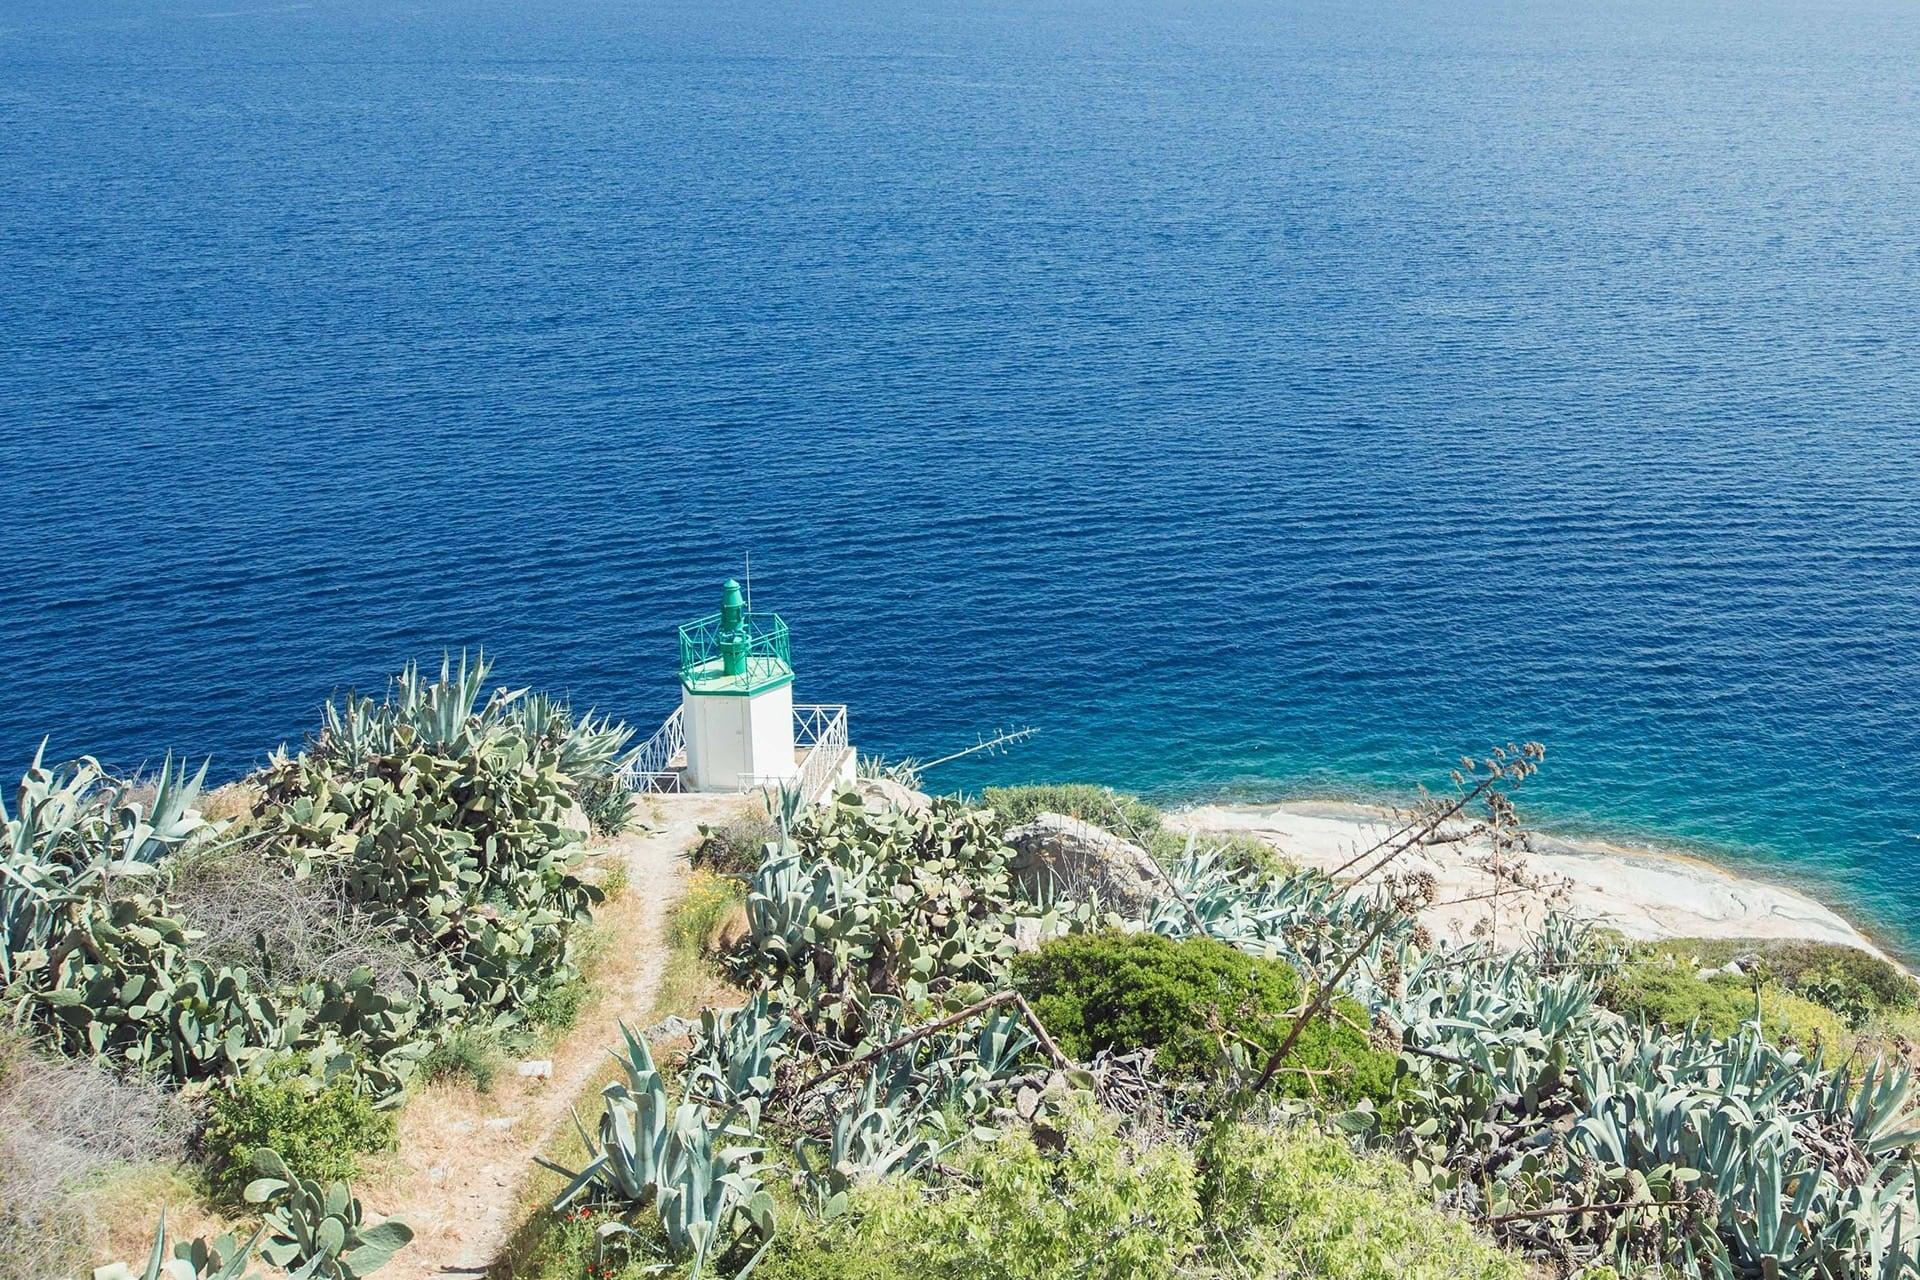 blog-voyage-sabine-kley-corse-balagne-calvi-phare